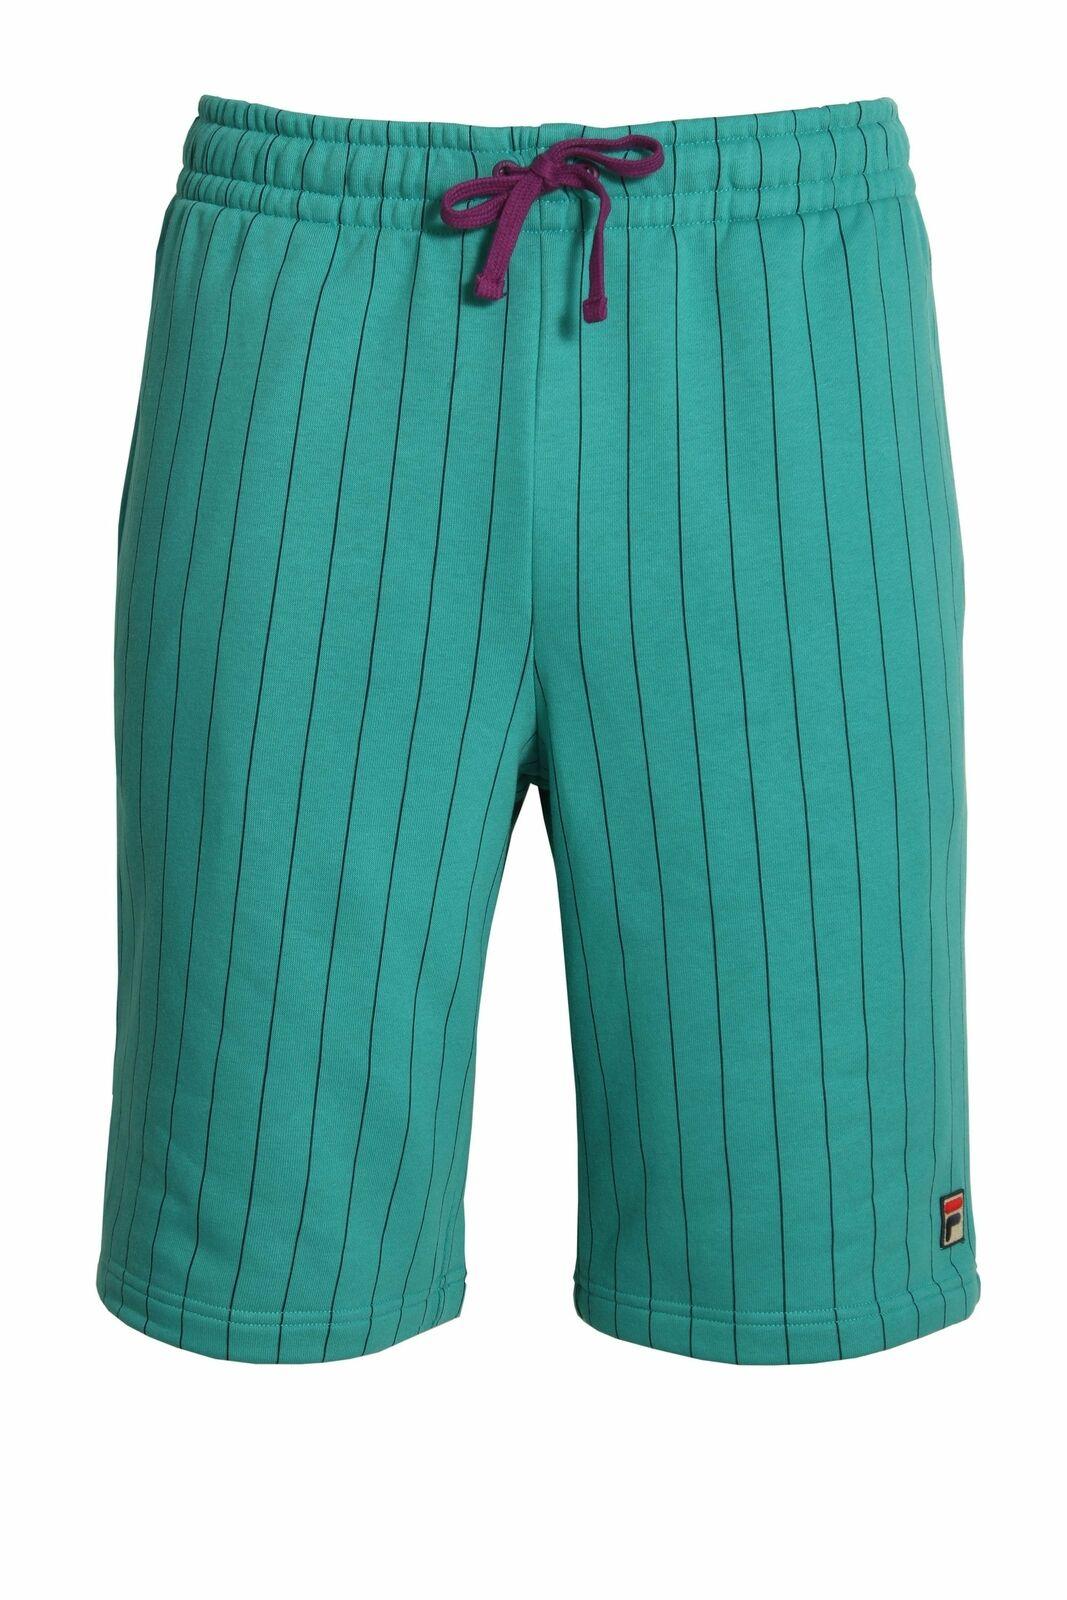 86df822e70e8a6 Mens Gym FILA VINTAGE Pinstripe Shorts Biscay Bay Shorts BB1 ...